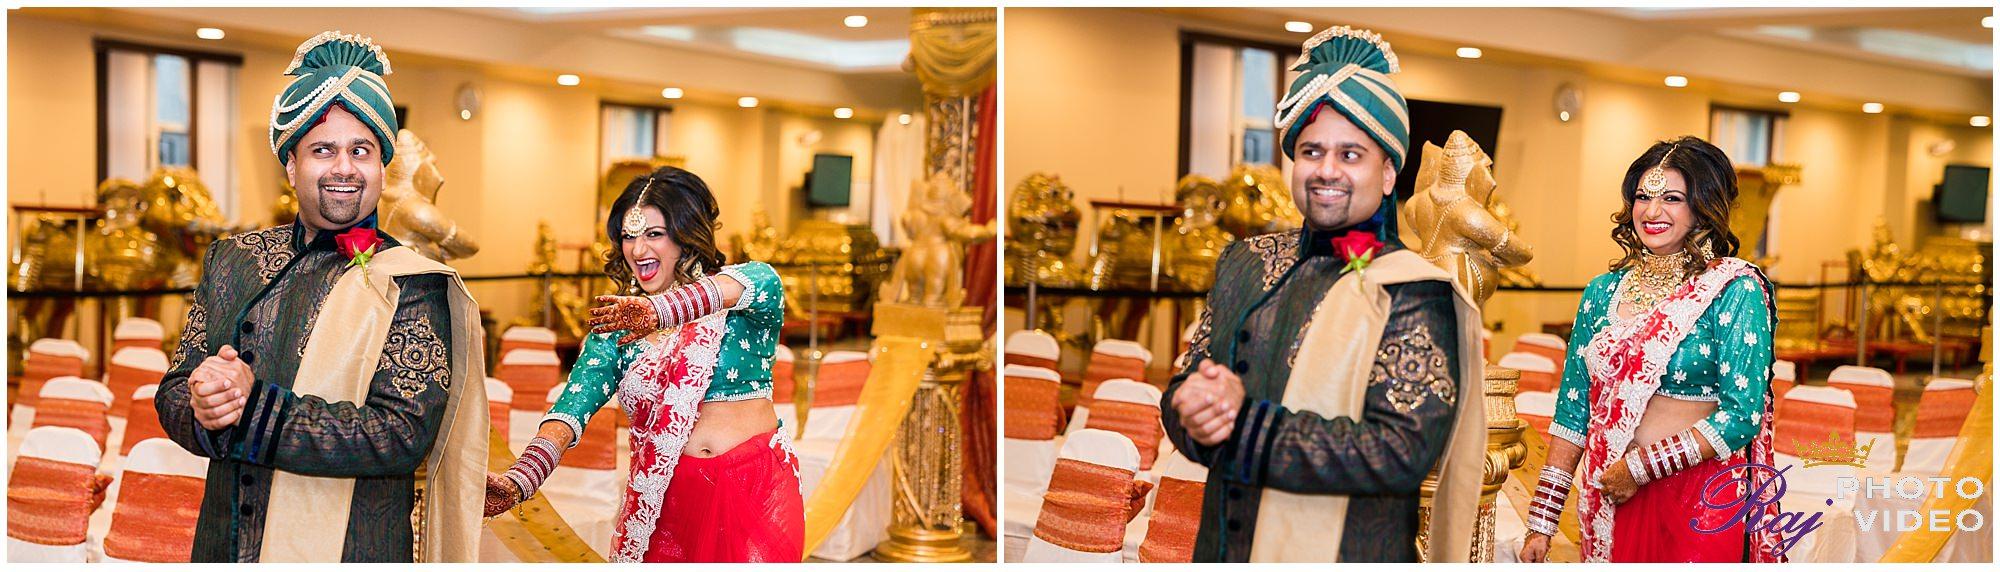 Sri-Guruvaayoorappan-Temple-Marlboro-NJ-Indian-Wedding-Chiyomi-Scott-00005.jpg